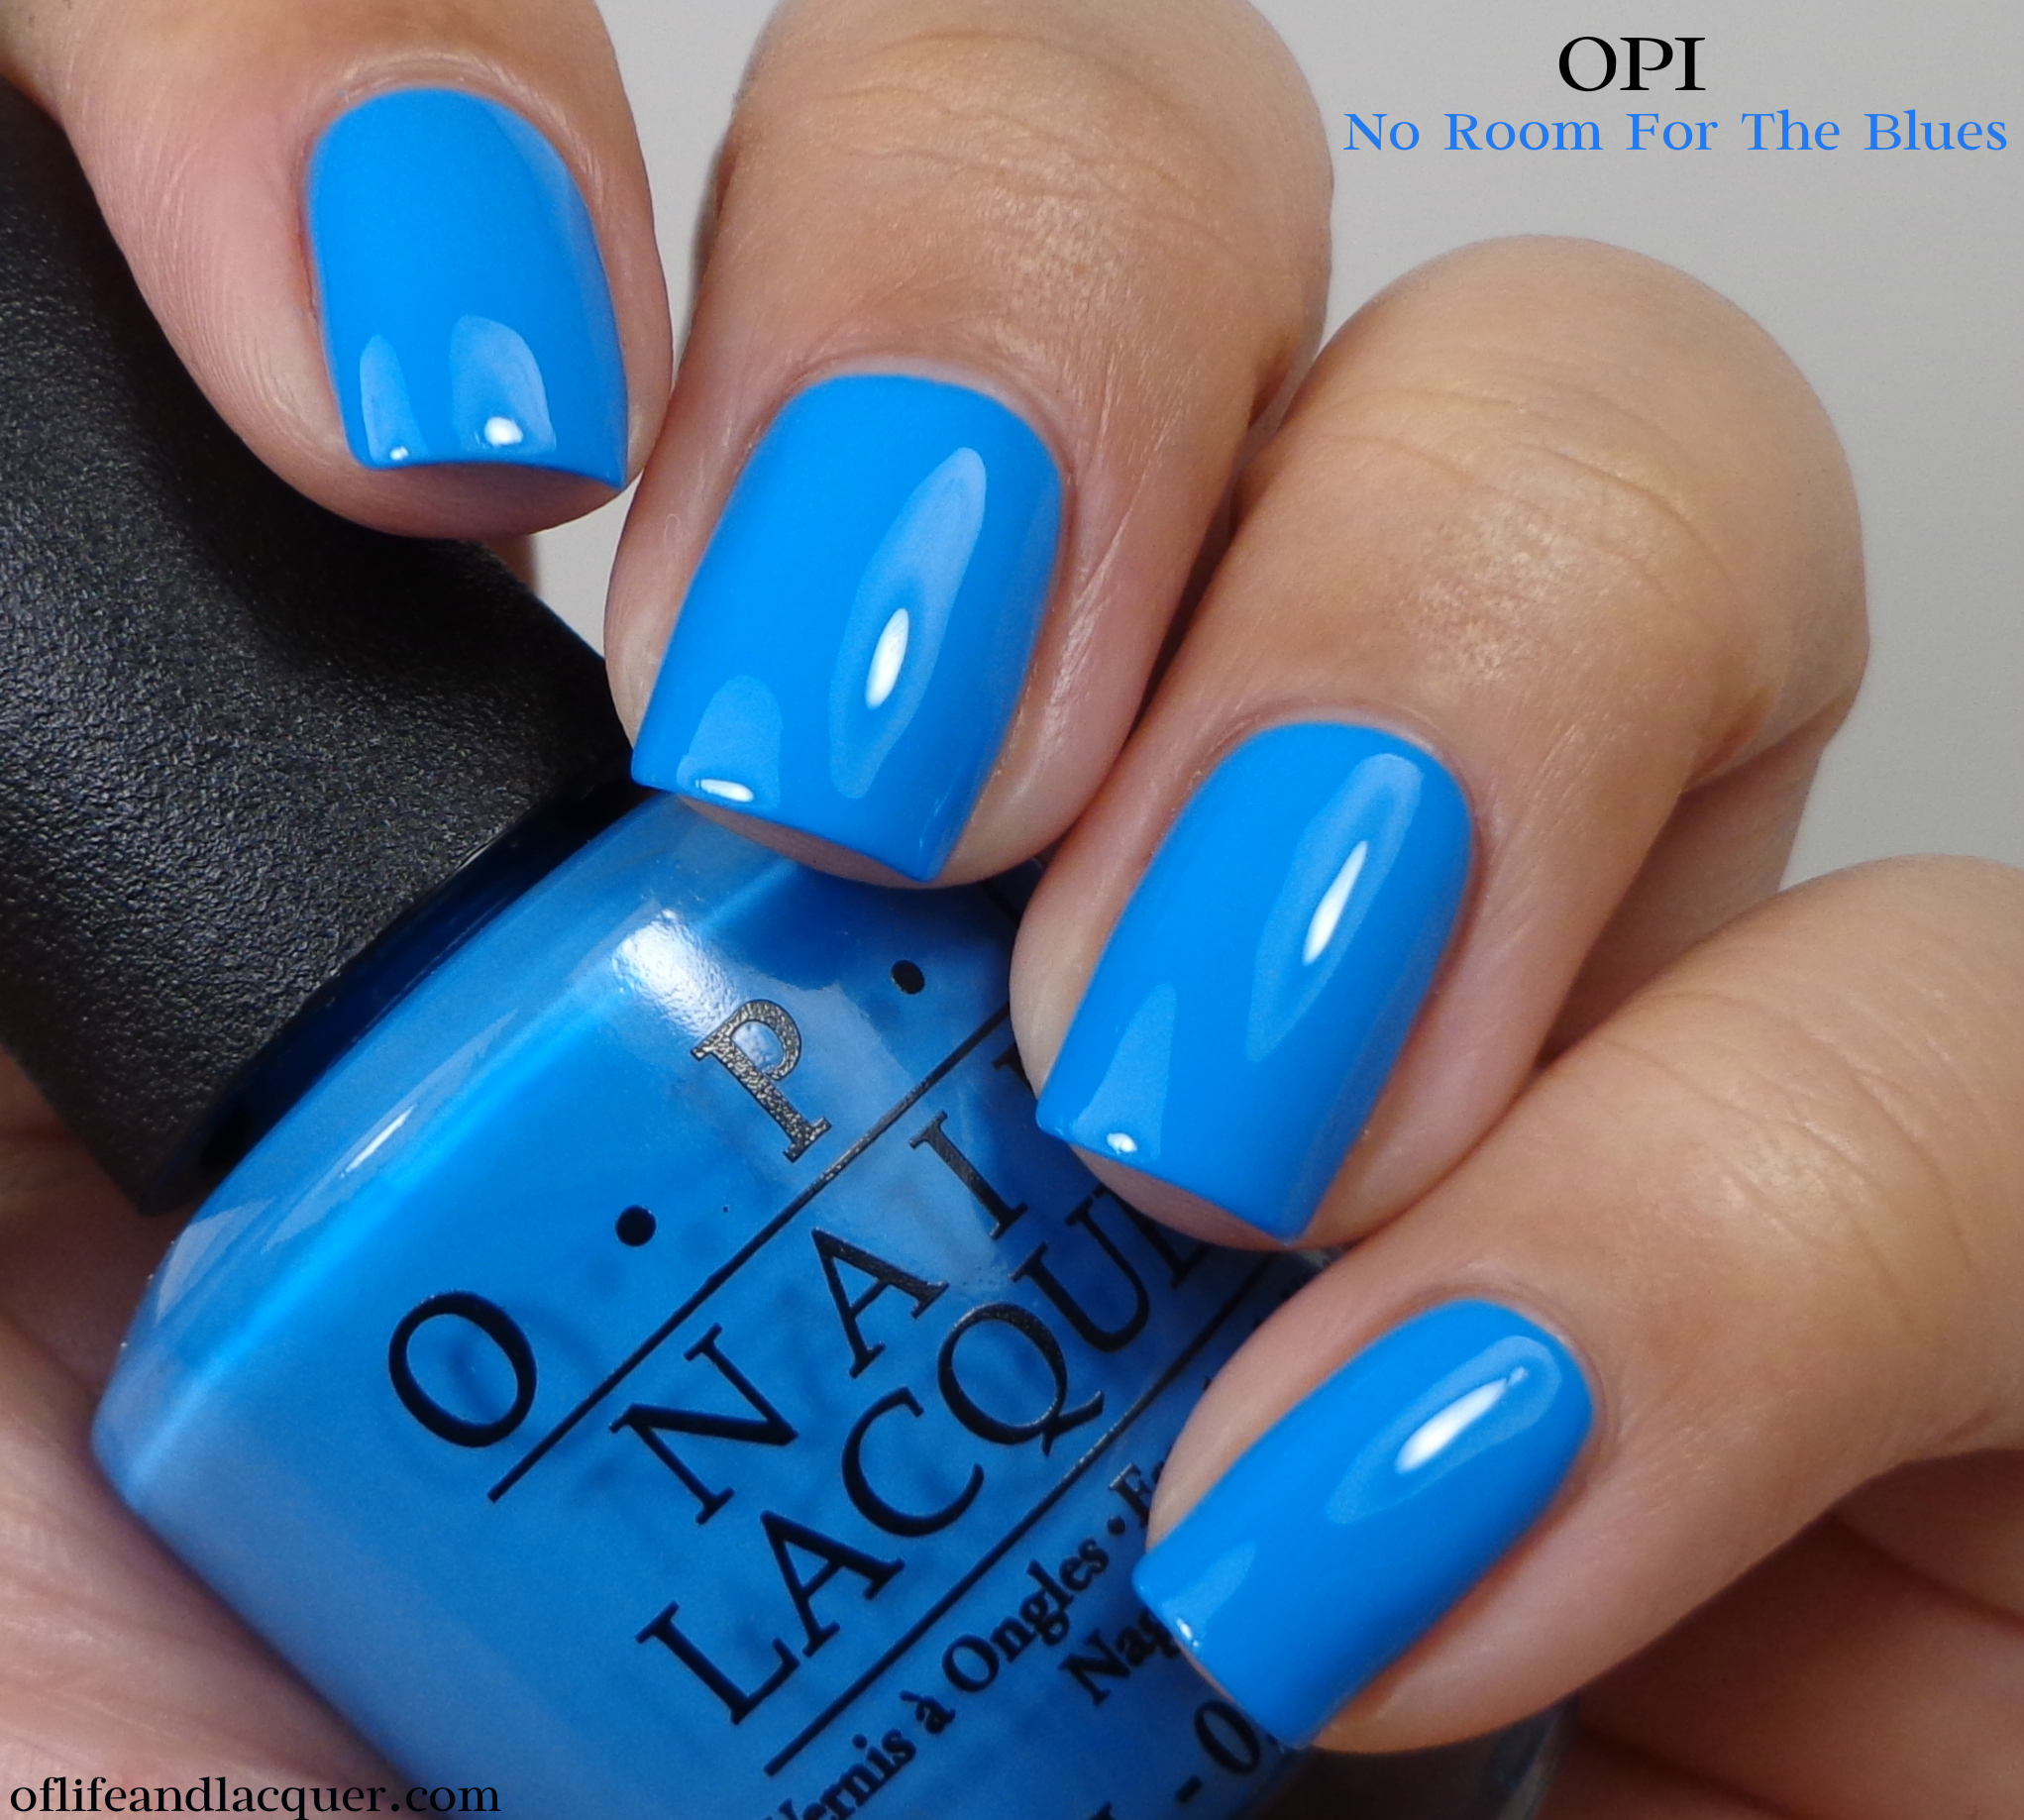 No Nail Polish: OPI No Room For The Blues...Cause I'm Feeling Blue